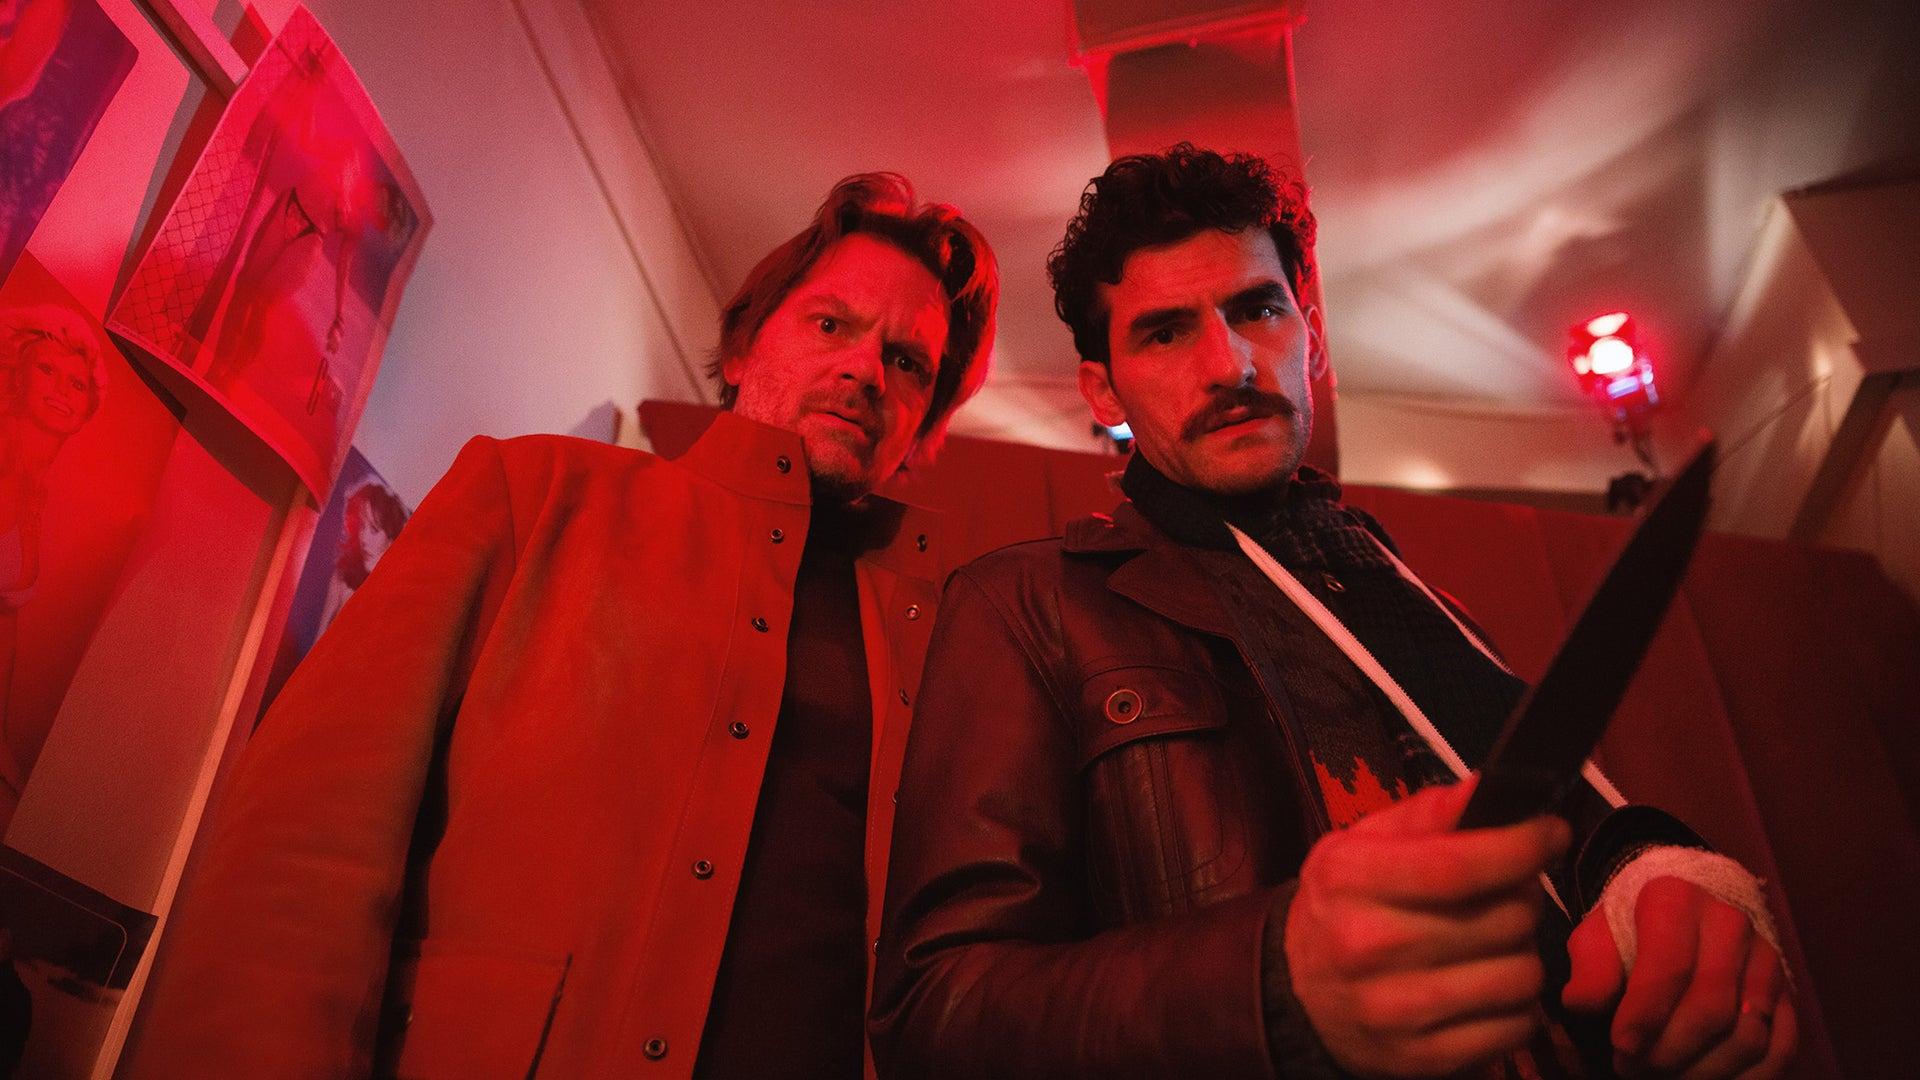 Florin Piersic Jr. and Corneliu Ulici, Comrade Detective